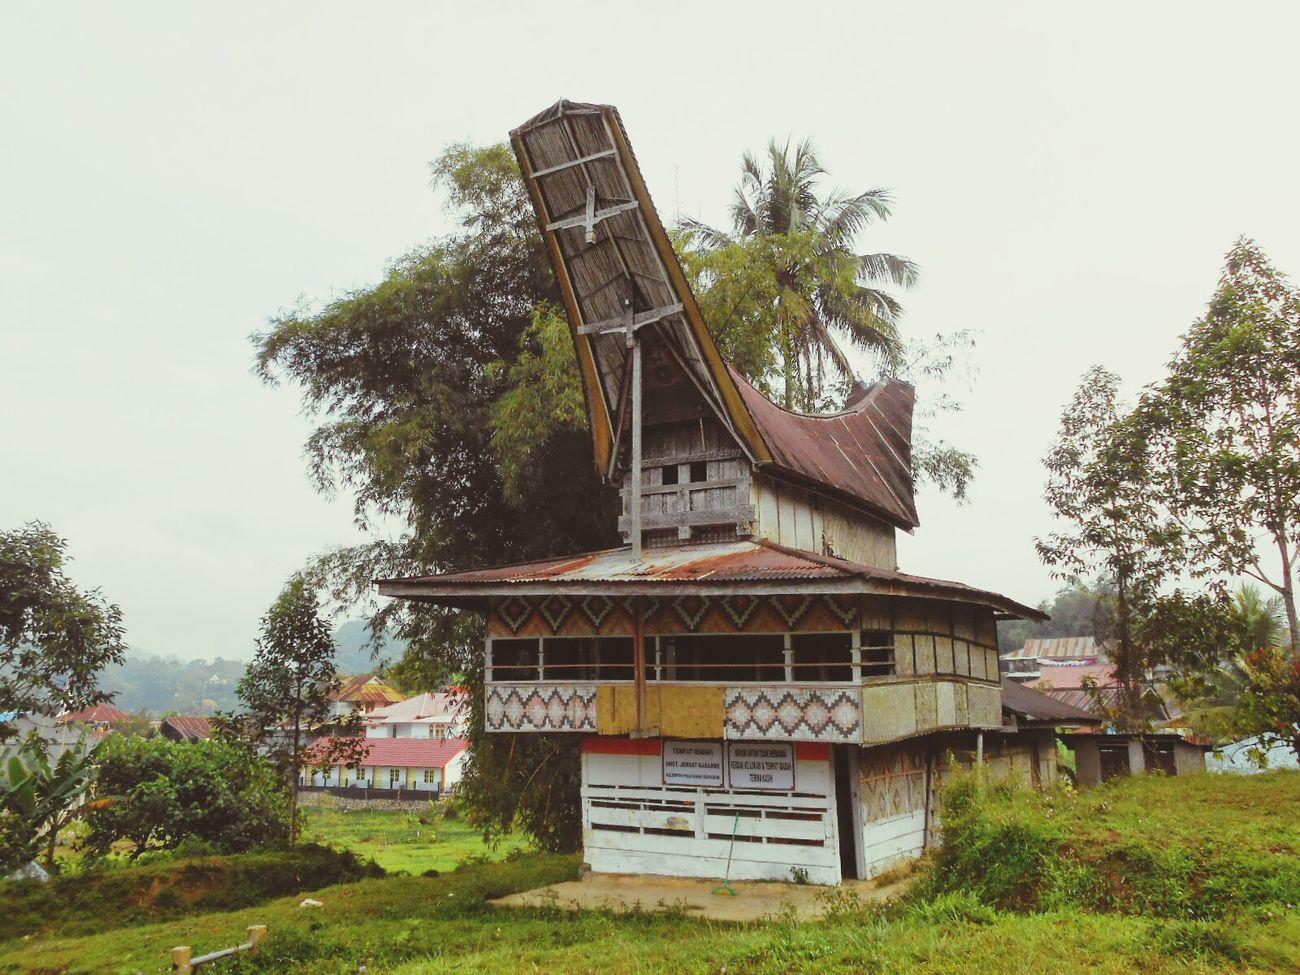 Architecture Toraja Utara Outdoors Nature Rantekarassik Rantepao